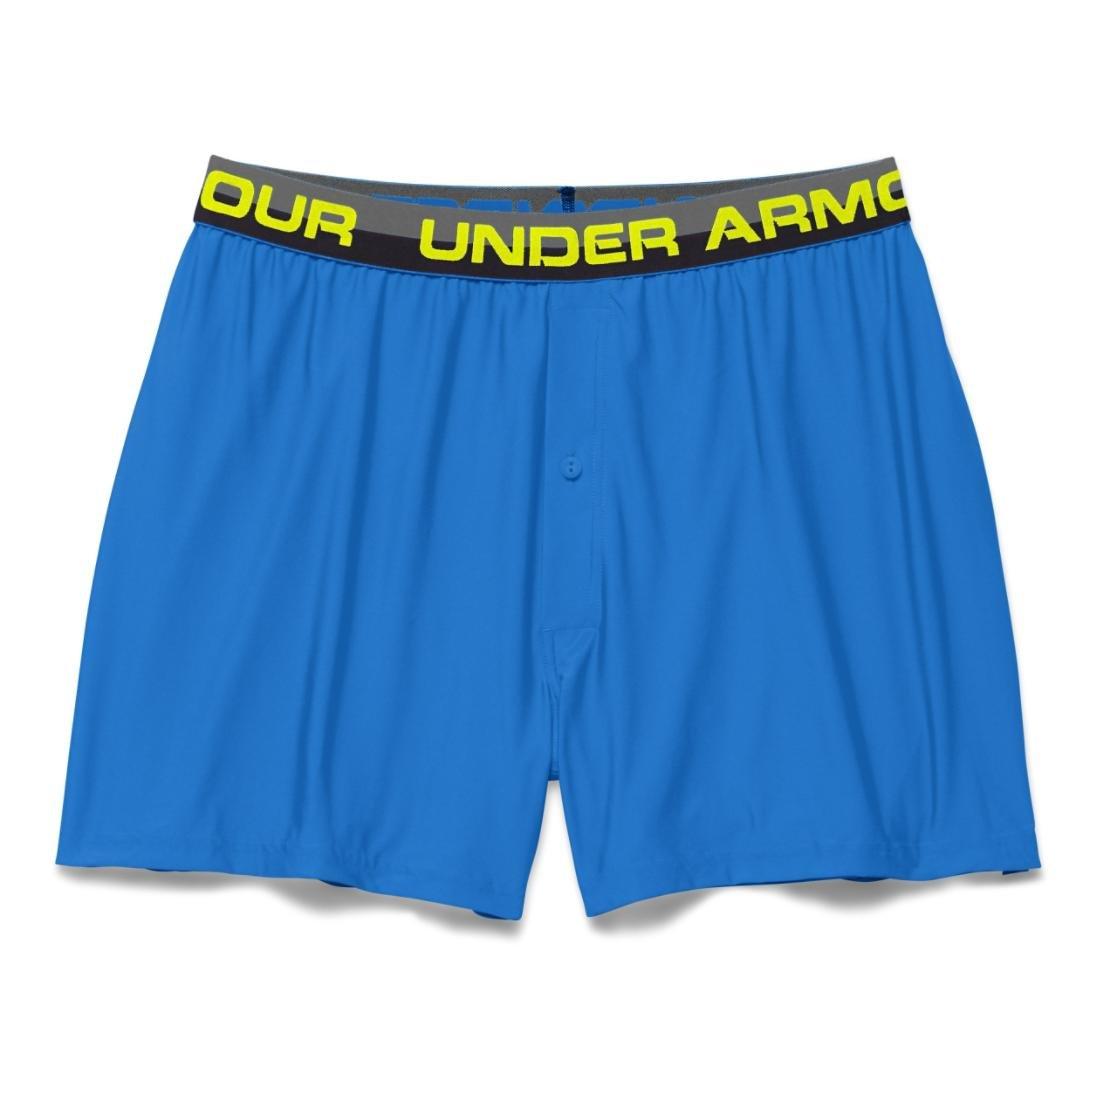 Under Armour Men's UA Original Series Boxer Shorts Small BLUE JET 00-QWGWM6-DE